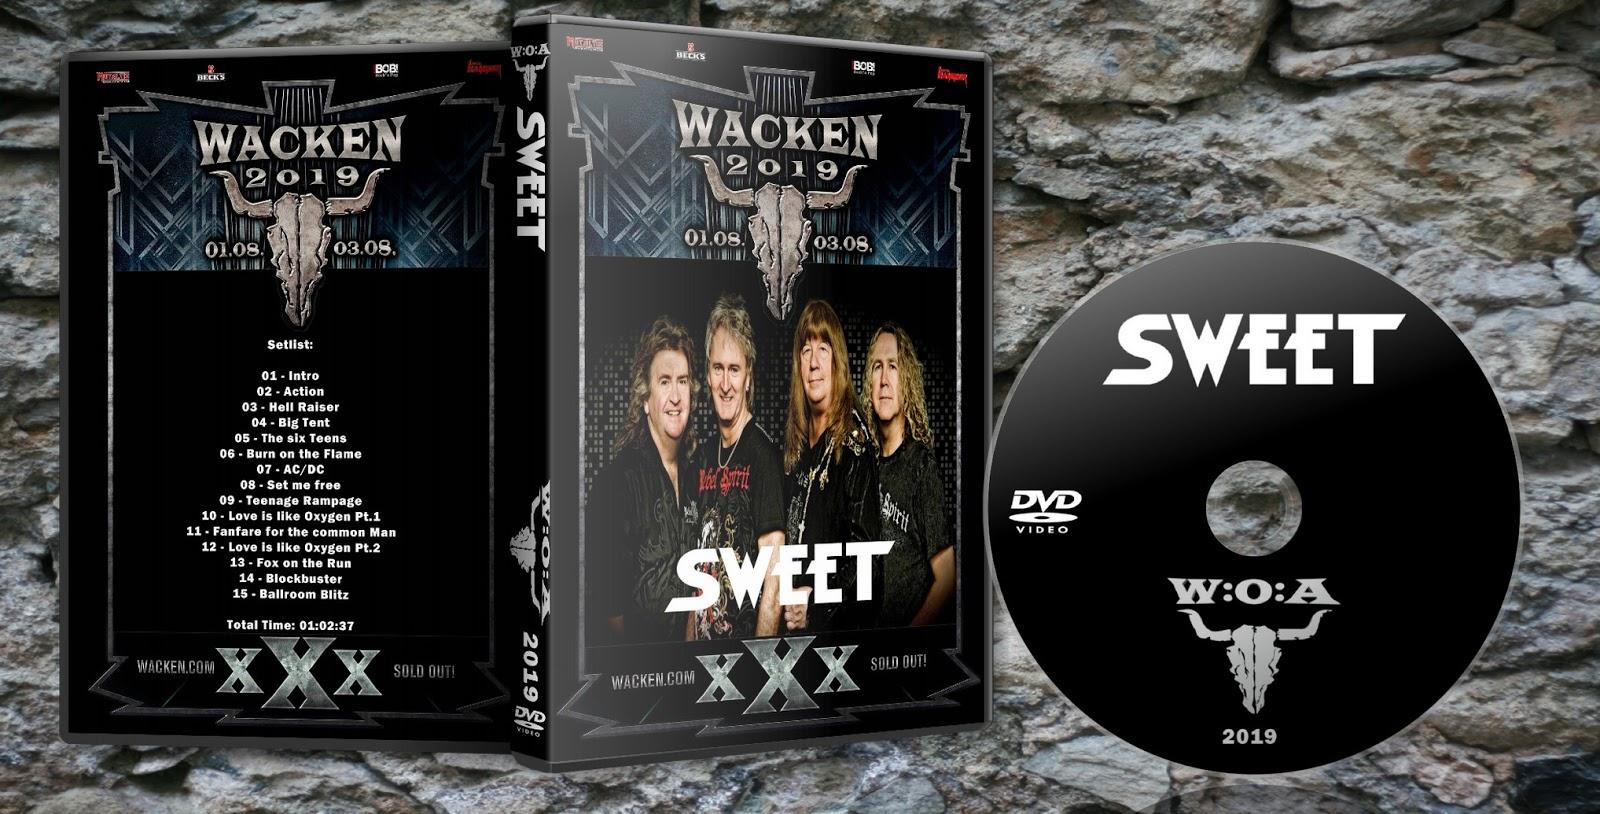 Deer5001RockCocert : The Sweet - 2019 - Wacken - HD-aud From